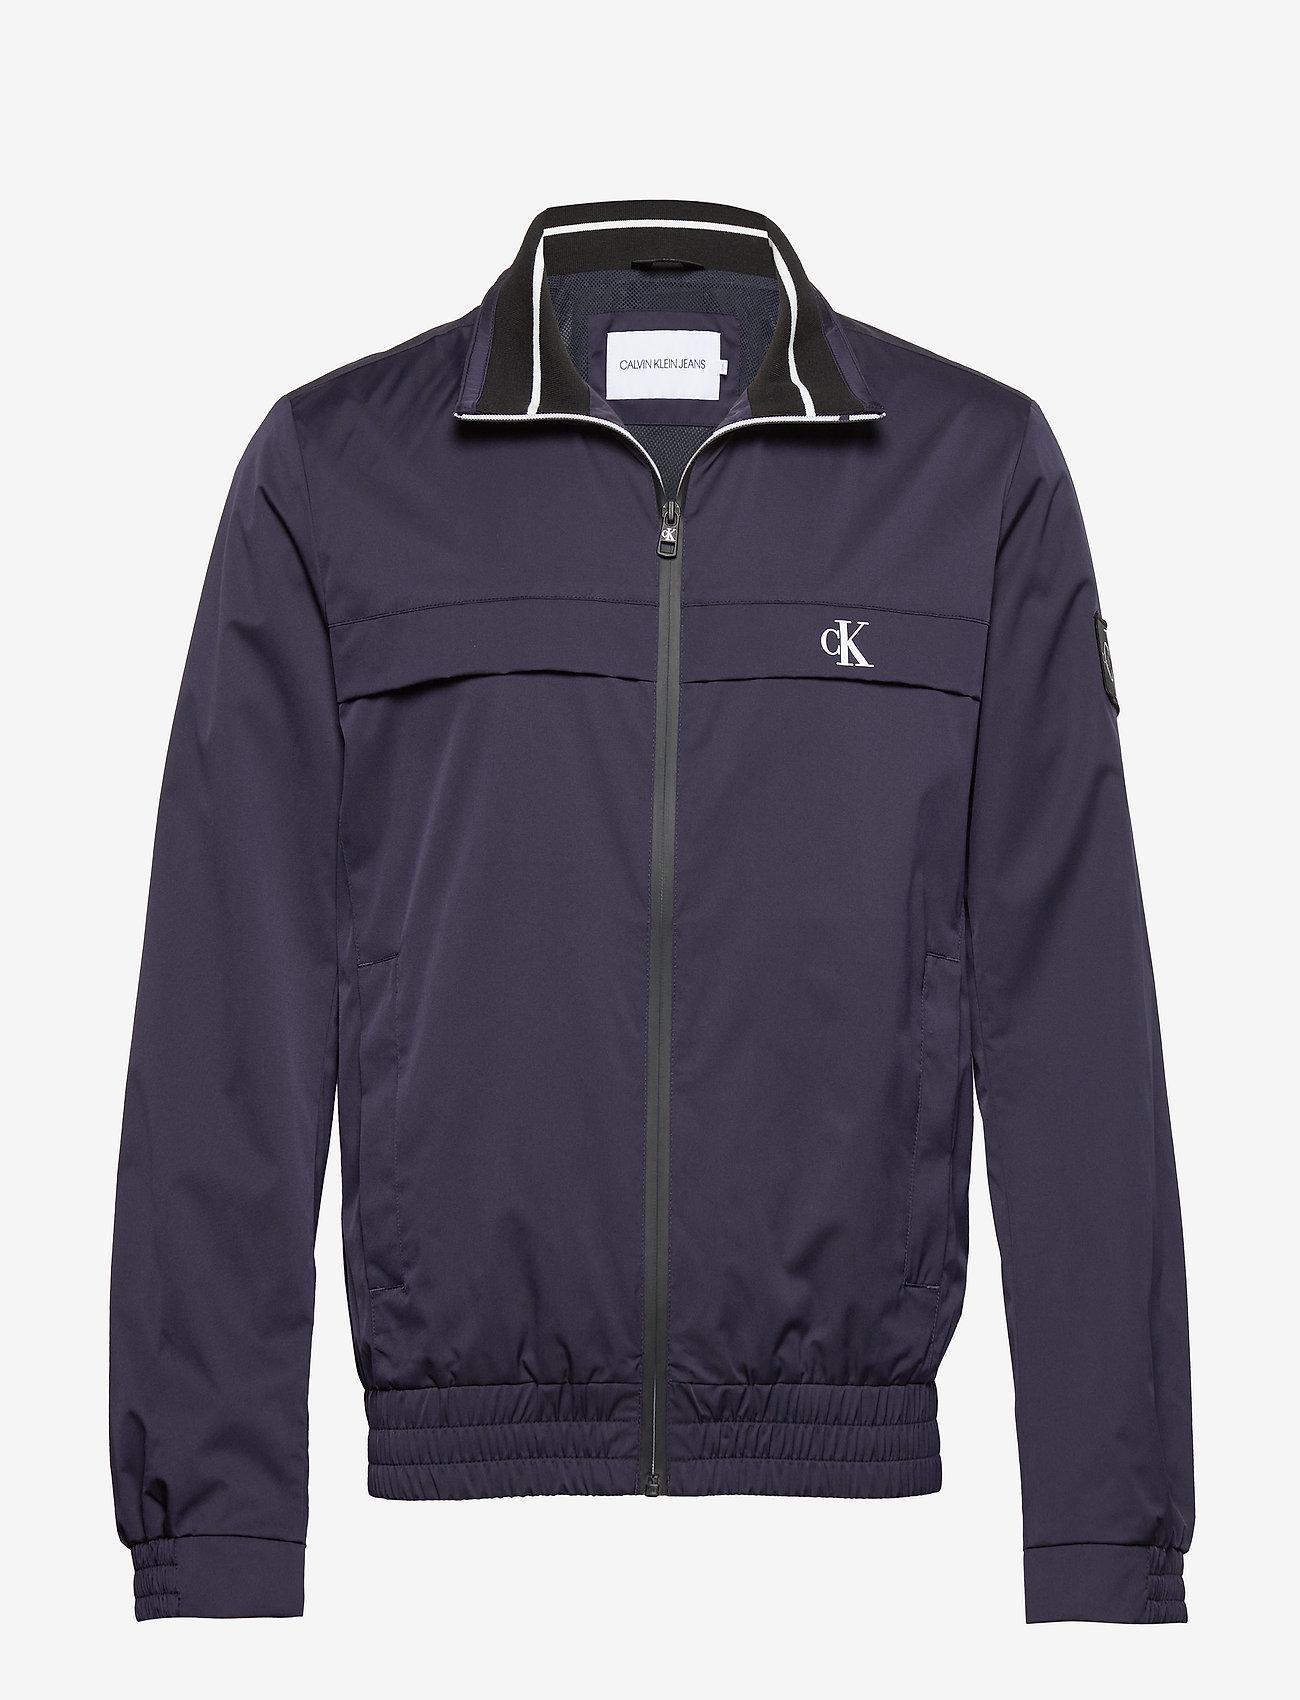 Calvin Klein Jeans - ZIP UP HARRINGTON - kurtki-wiosenne - night sky - 0